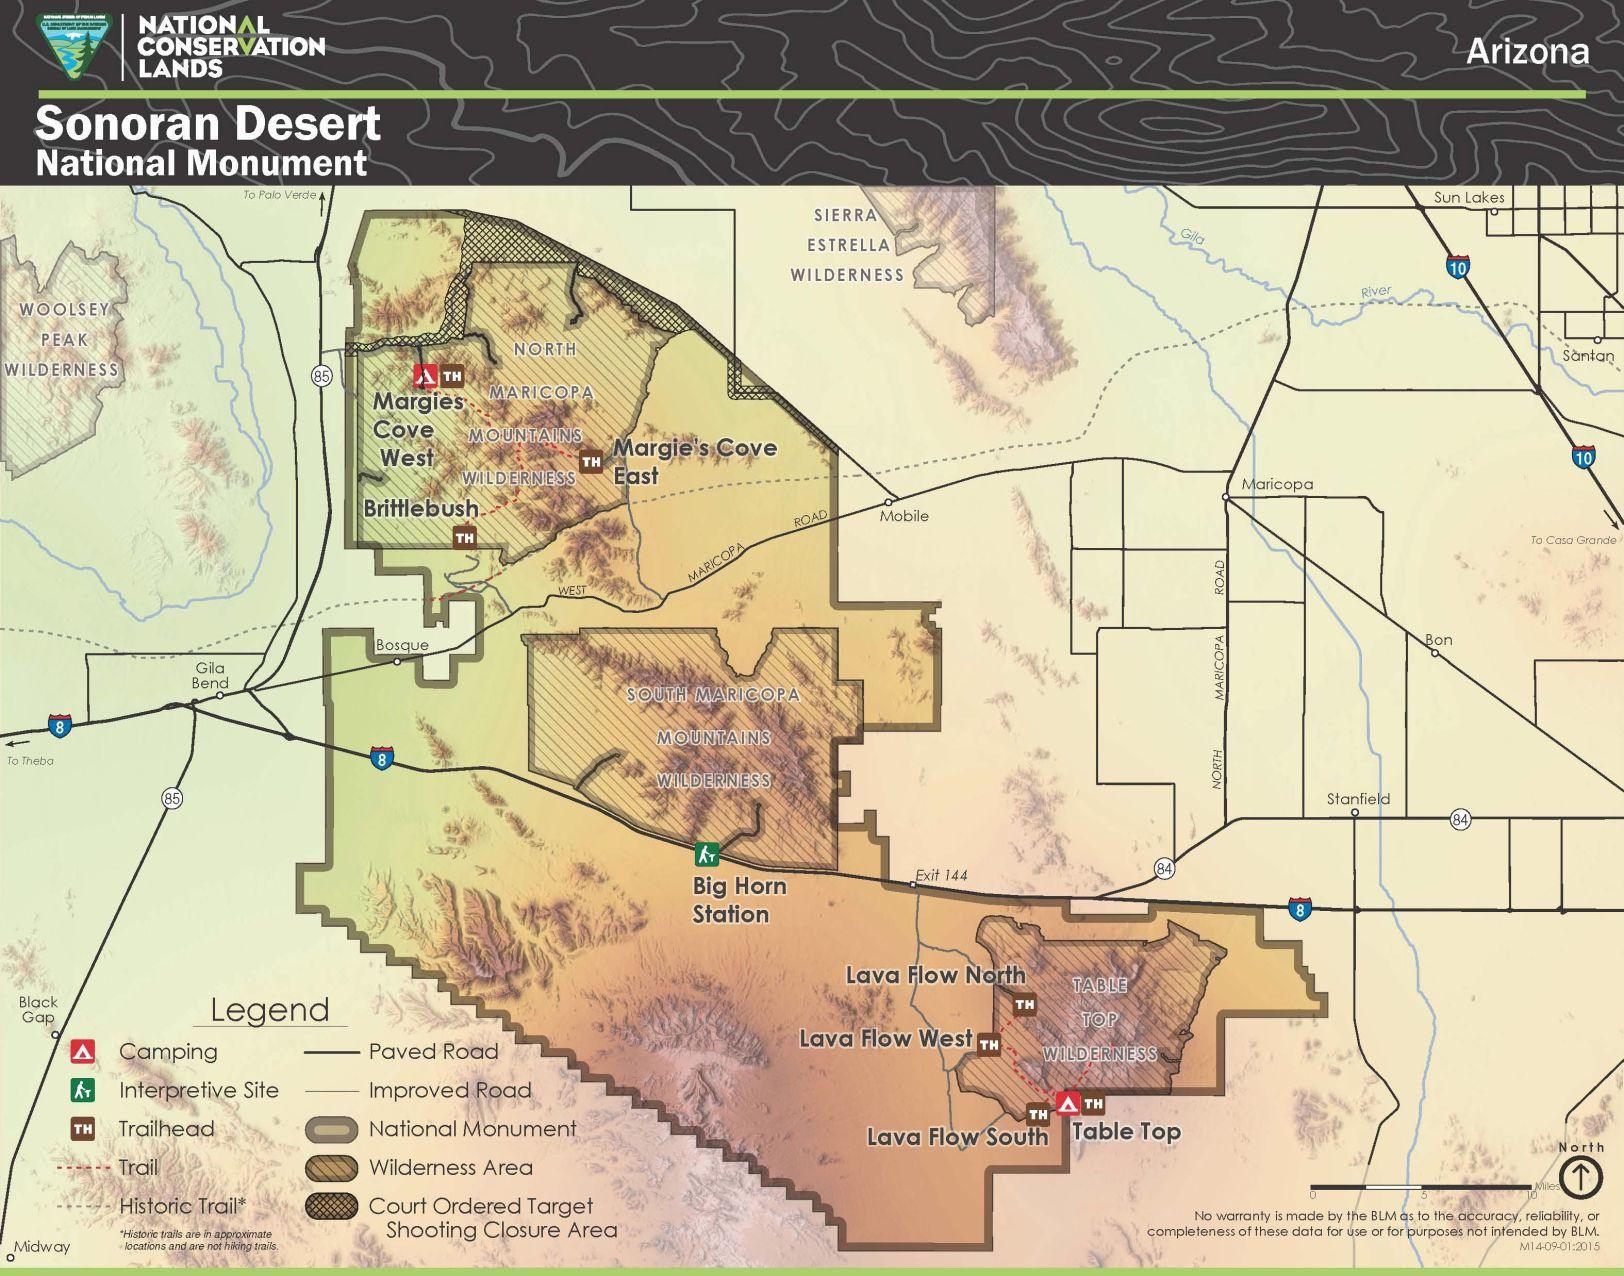 BLM seeks public input for Sonoran Desert National Monument plan